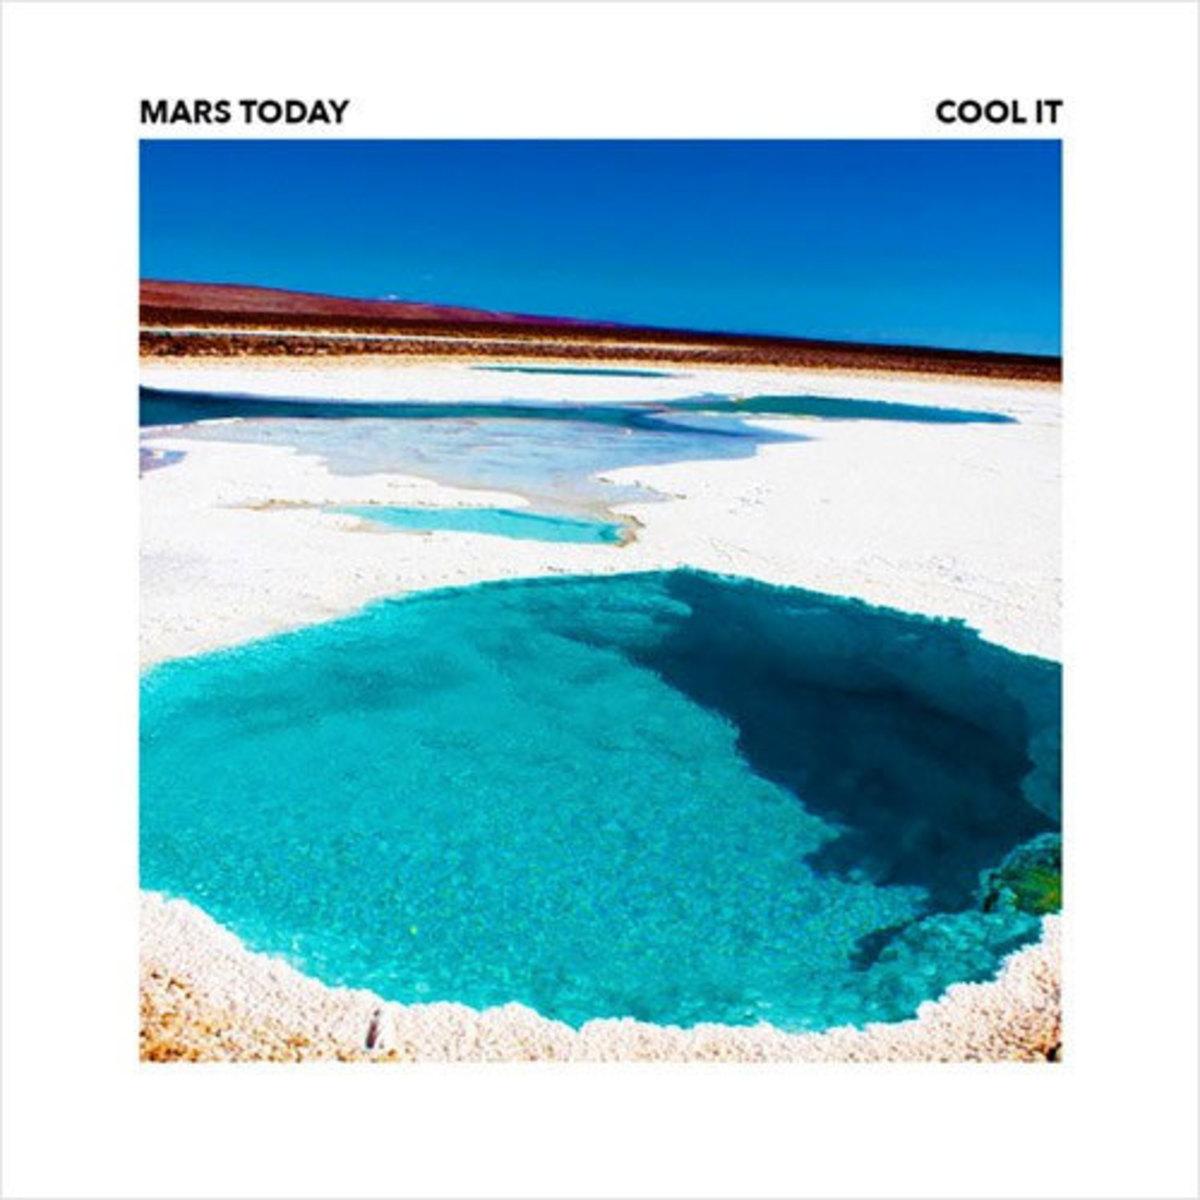 mars-today-cool-it.jpg